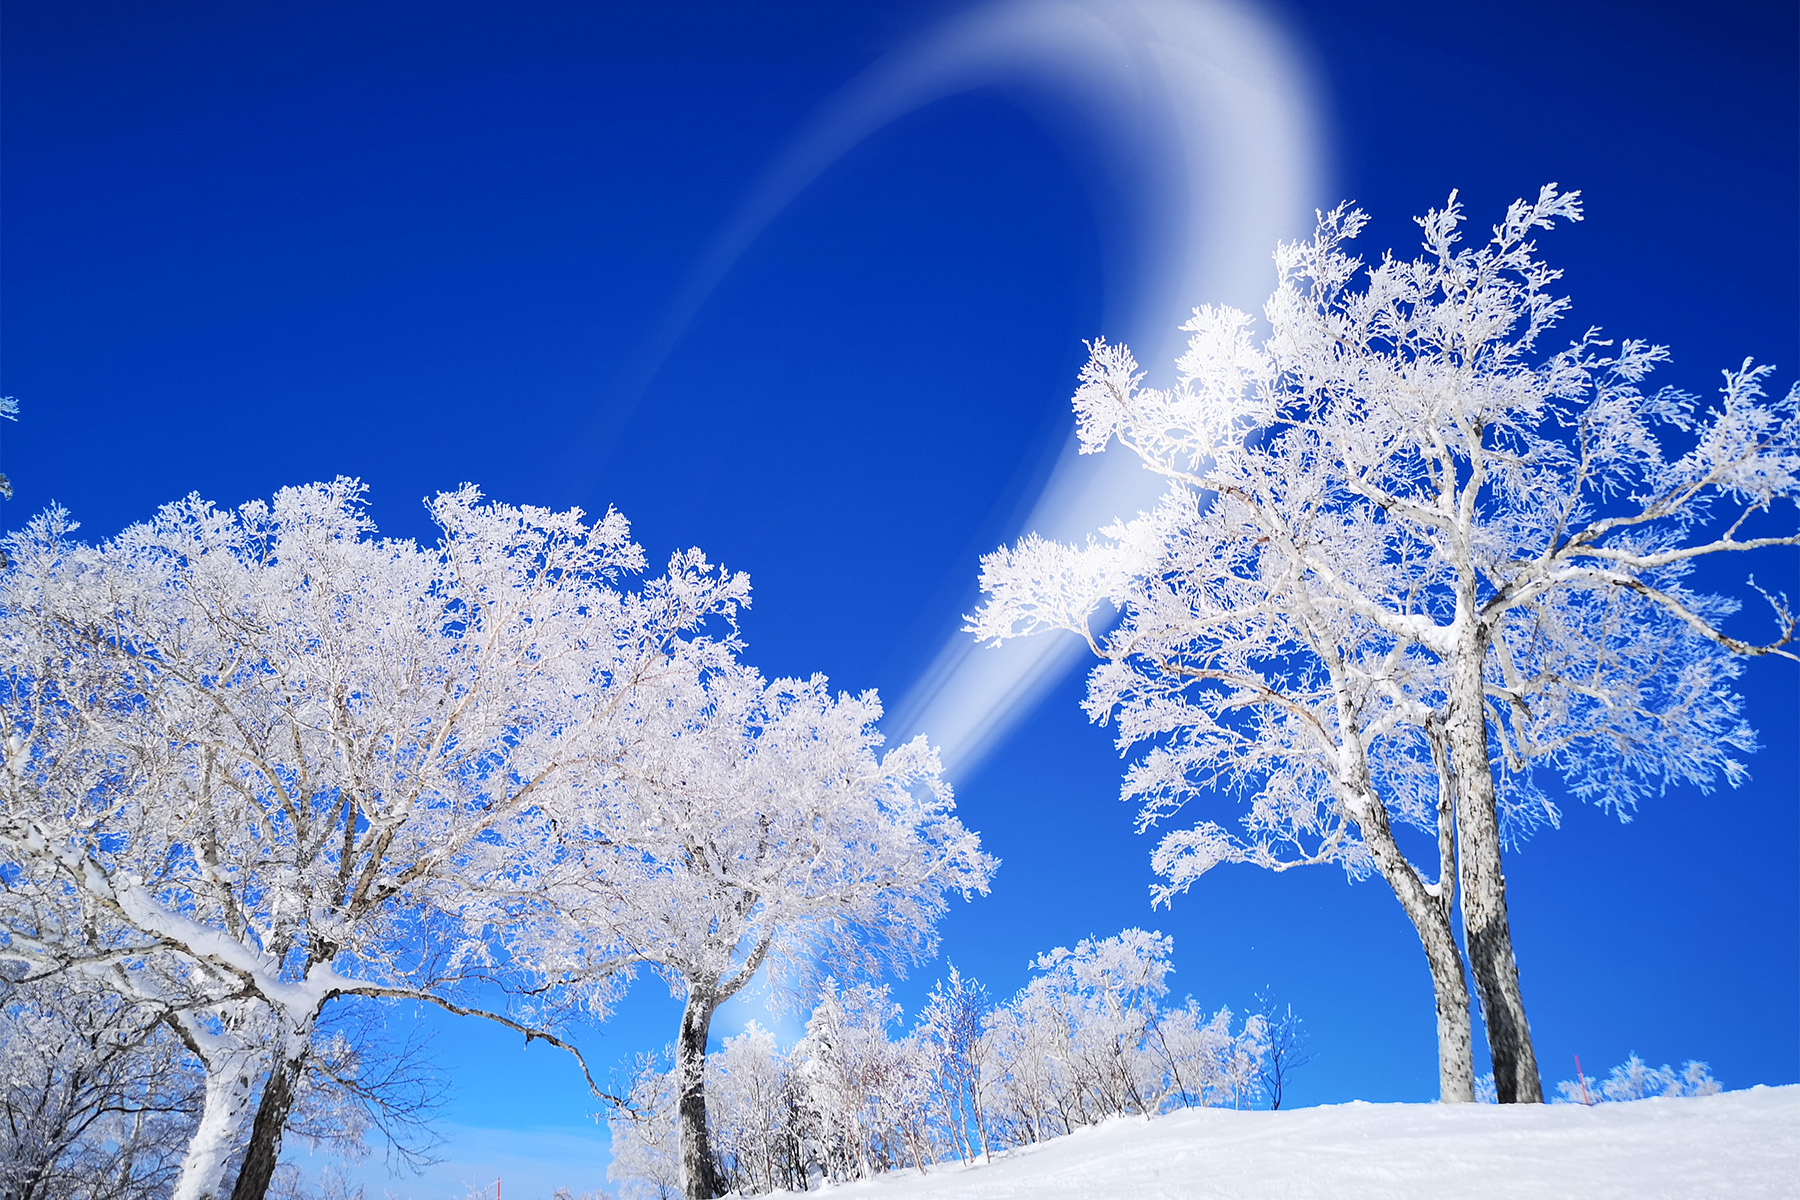 Travel Thursday: Do You Miss the Cold Air? Kiroro, Hokkaido, Japan